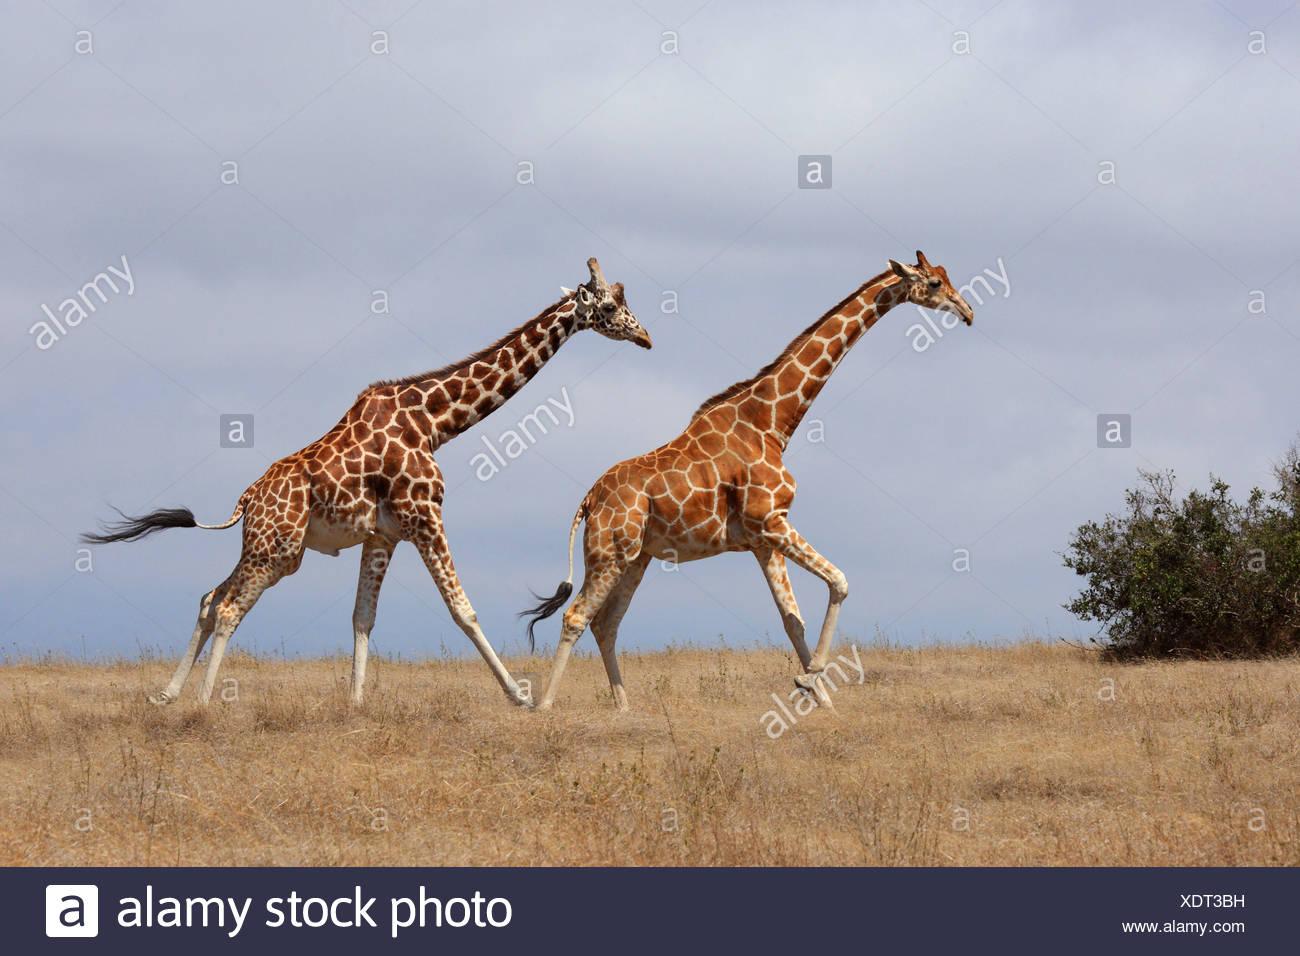 Giraffe réticulée (Giraffa camelopardalis reticulata), deux girafes à travers la savane, Kenya, Sweetwater Game Reserve Banque D'Images